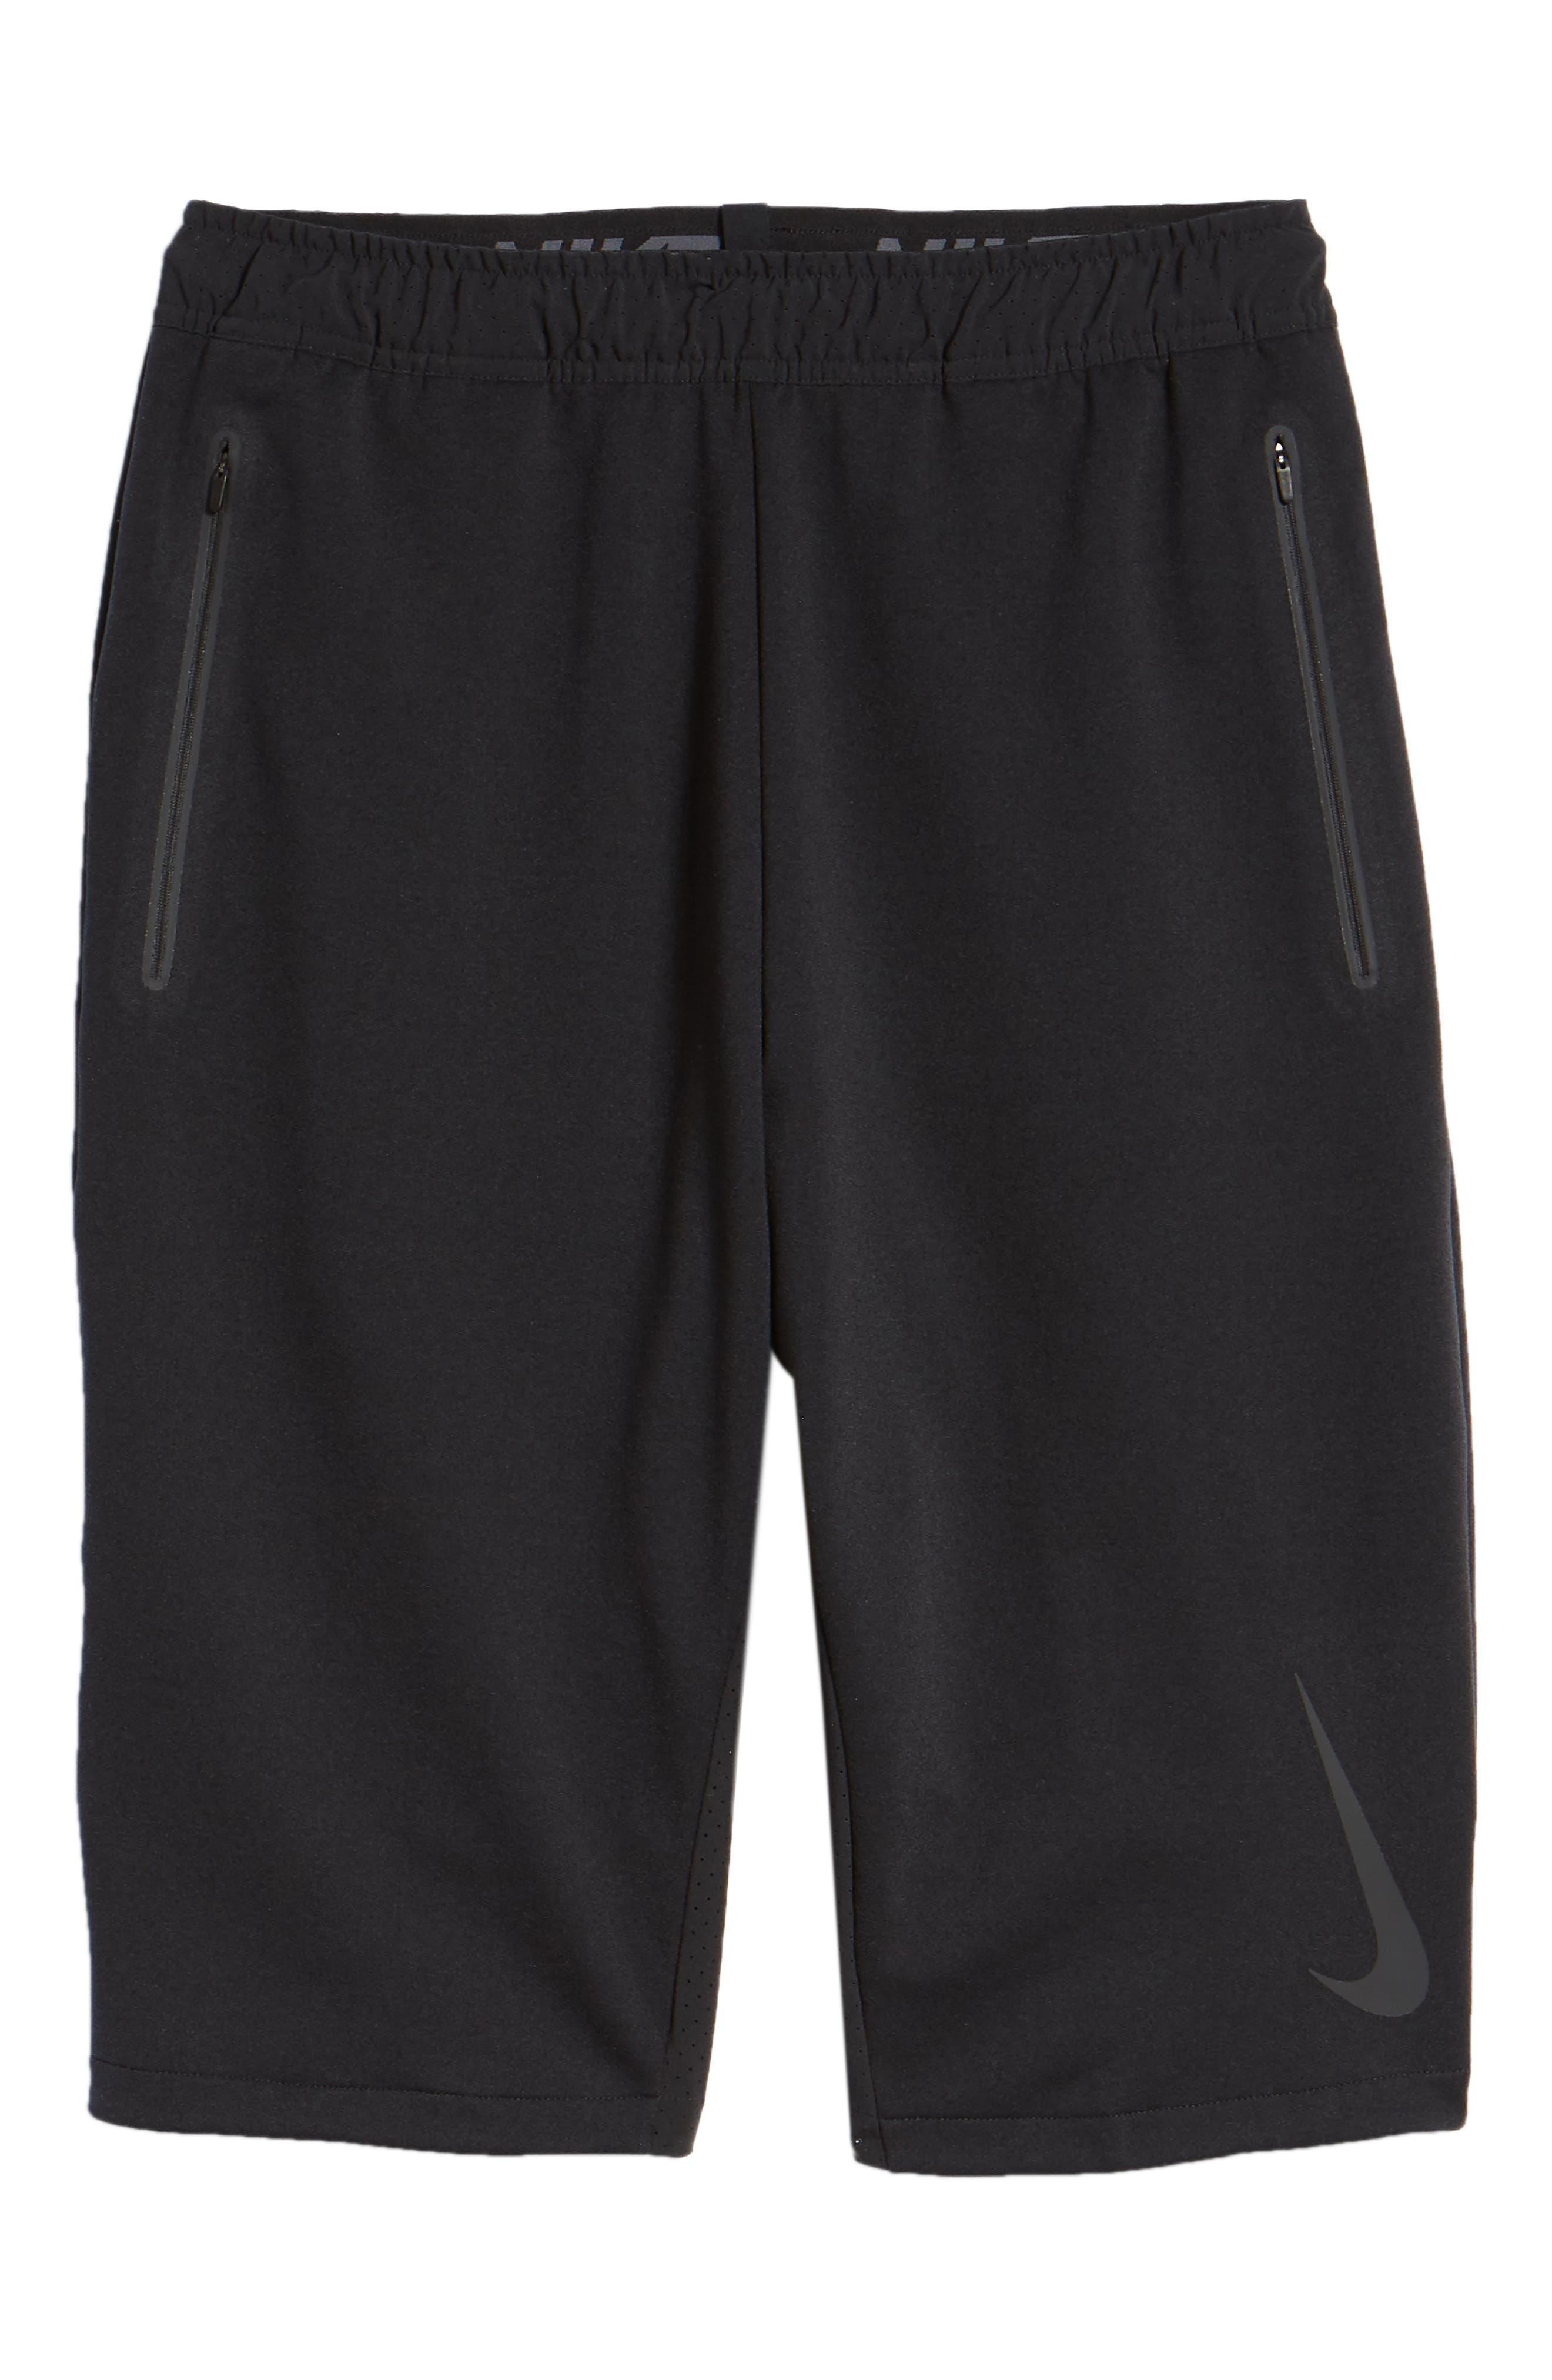 Dry Max Training Shorts,                             Alternate thumbnail 6, color,                             010